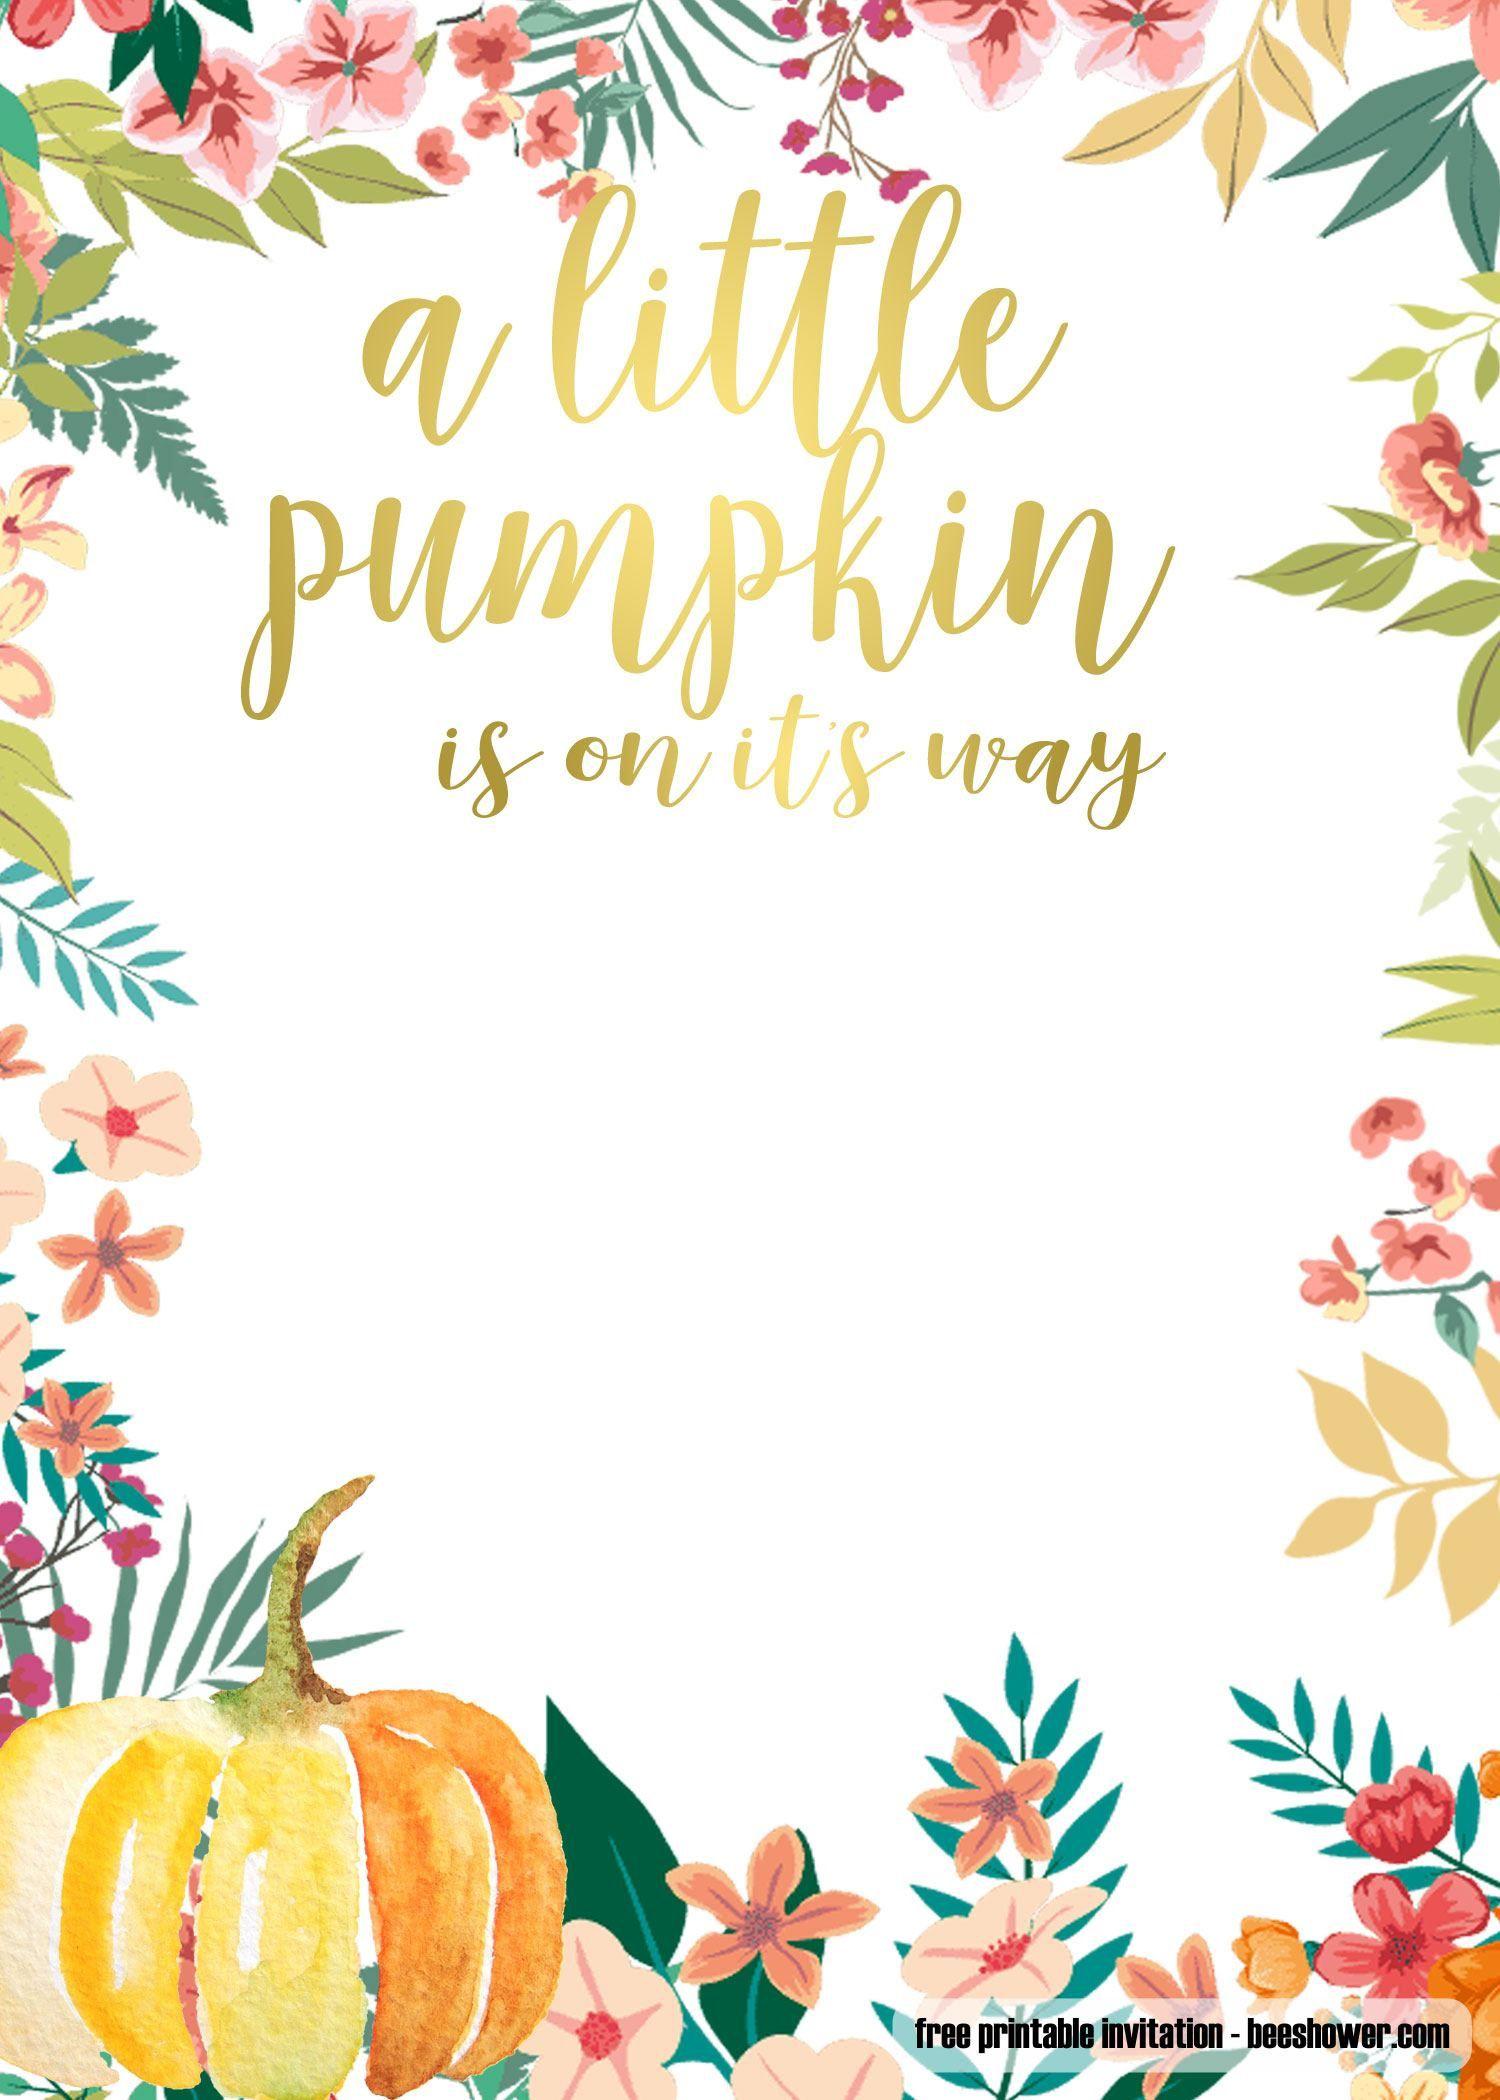 005 Wonderful Free Fall Invitation Template Printable Photo  Wedding For Mac Sunflower BurgundyFull